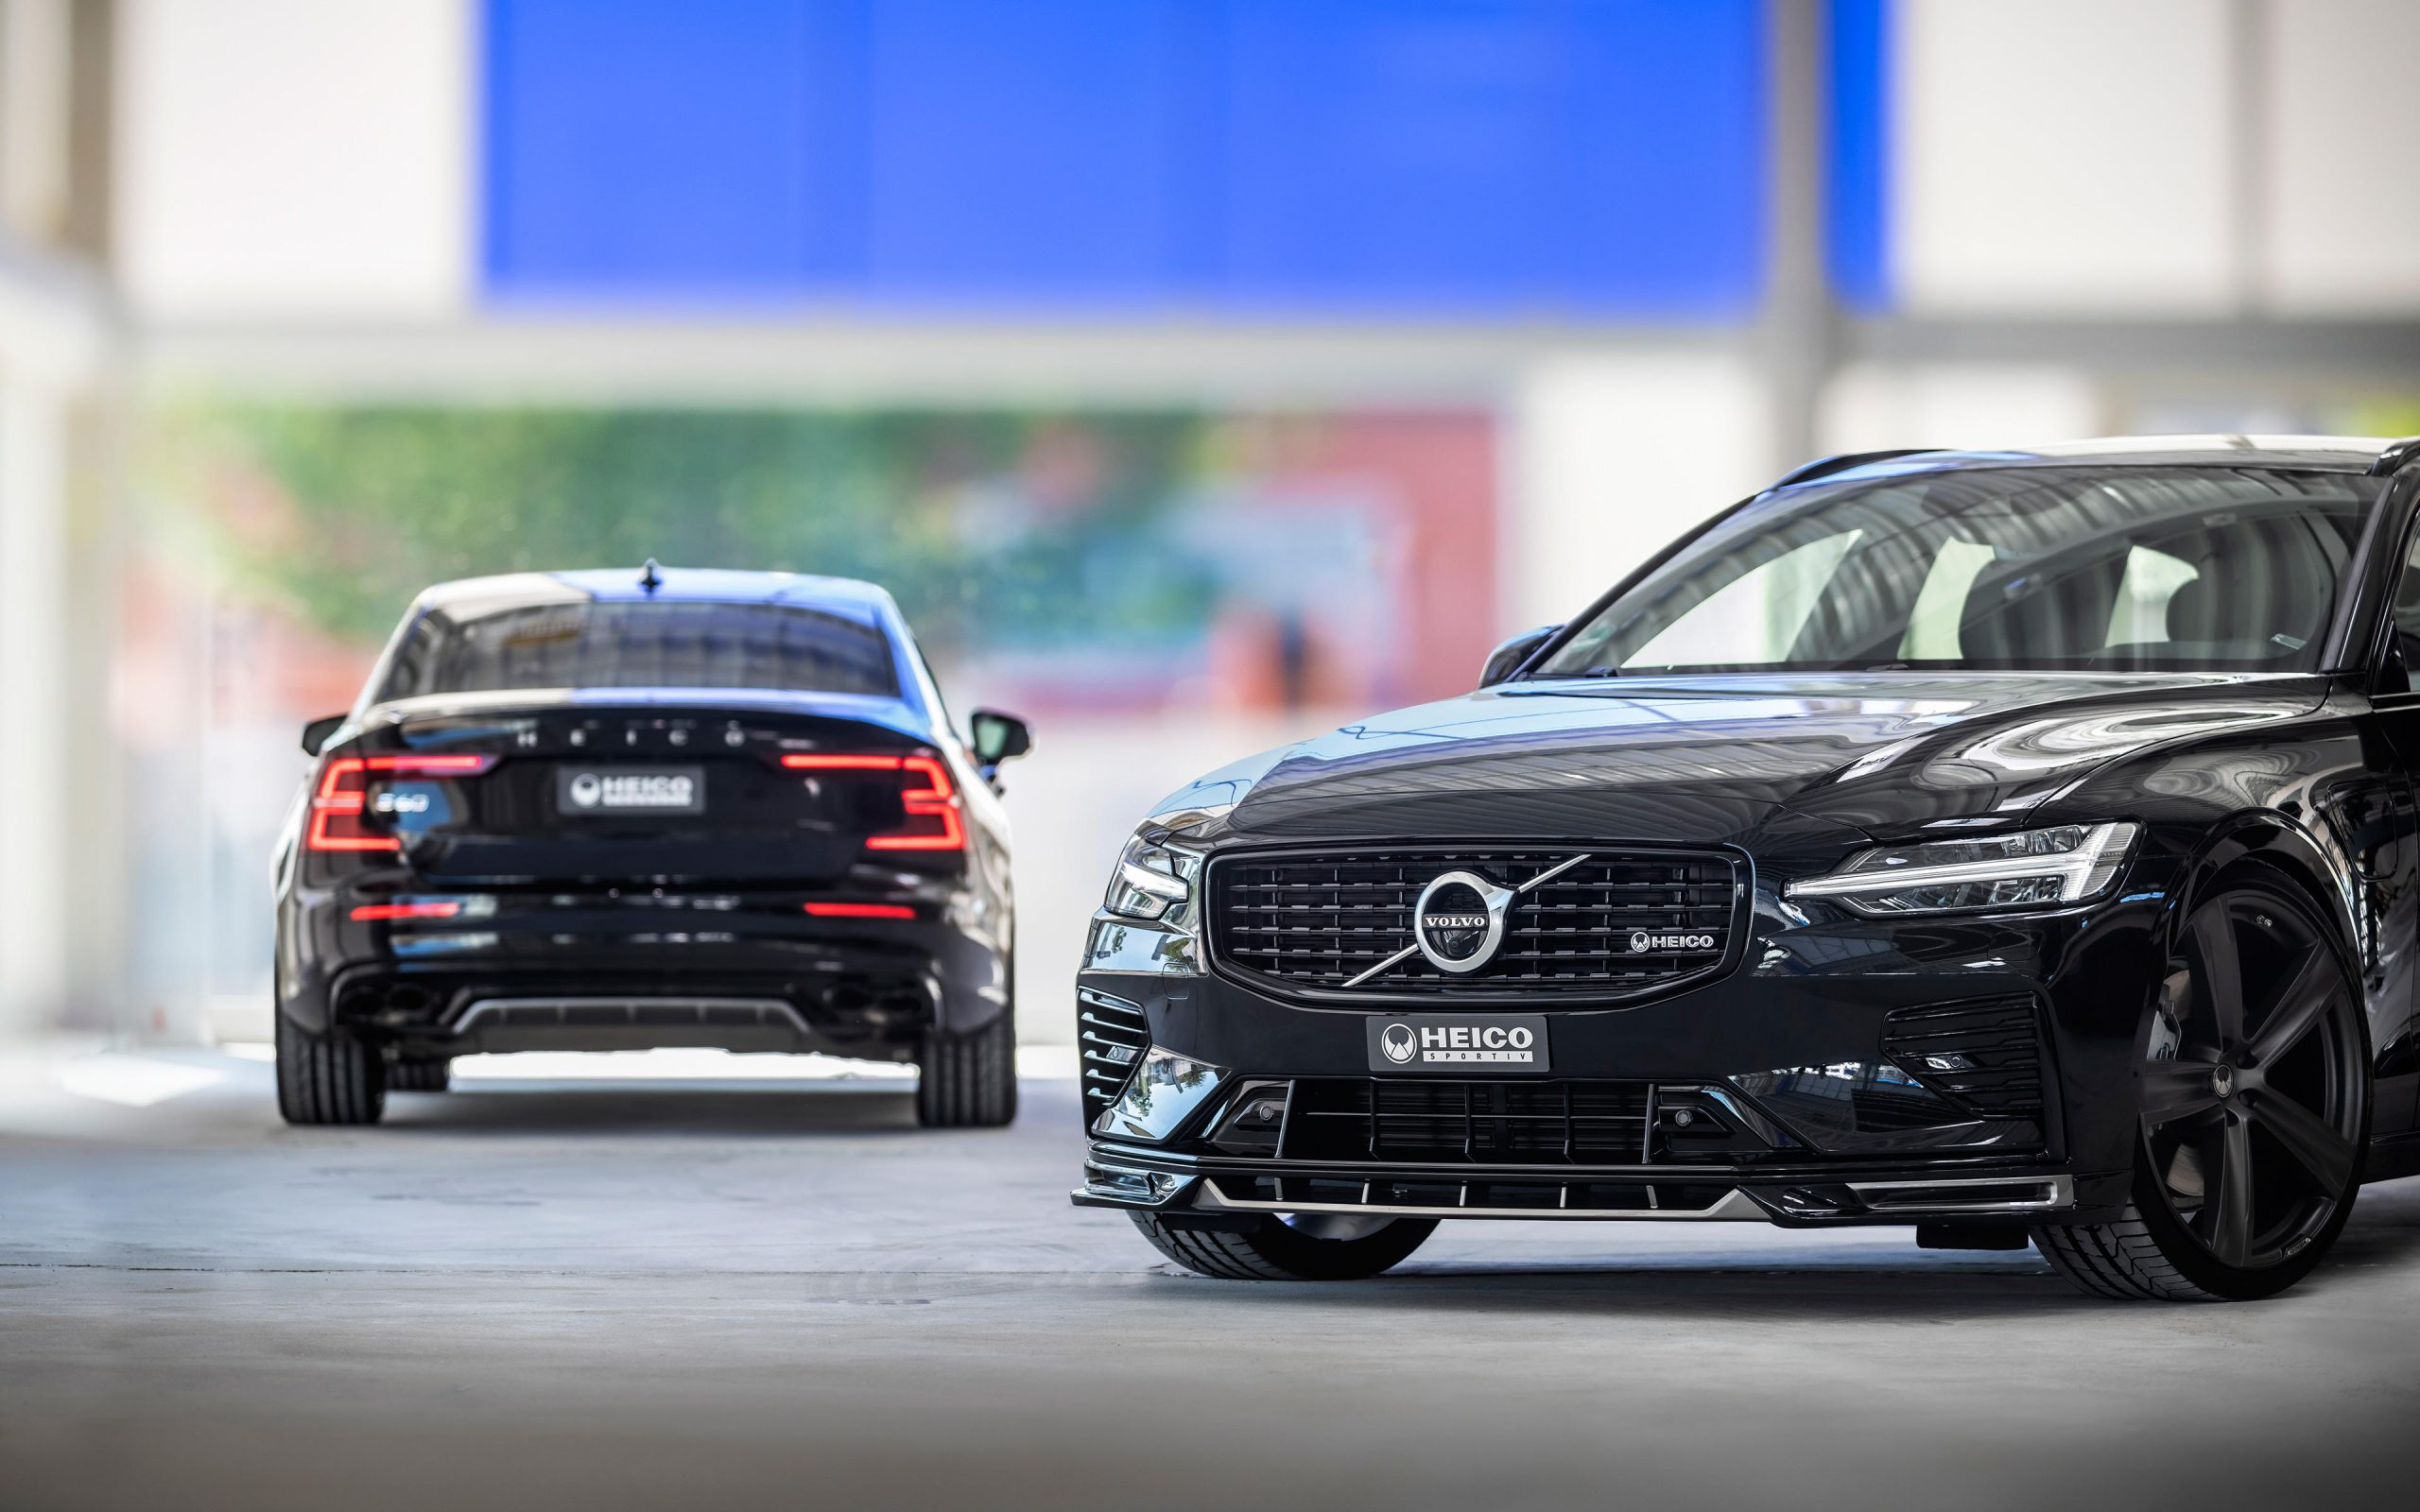 heico-sportiv-s60-224-rear-v60-225-black-front-02